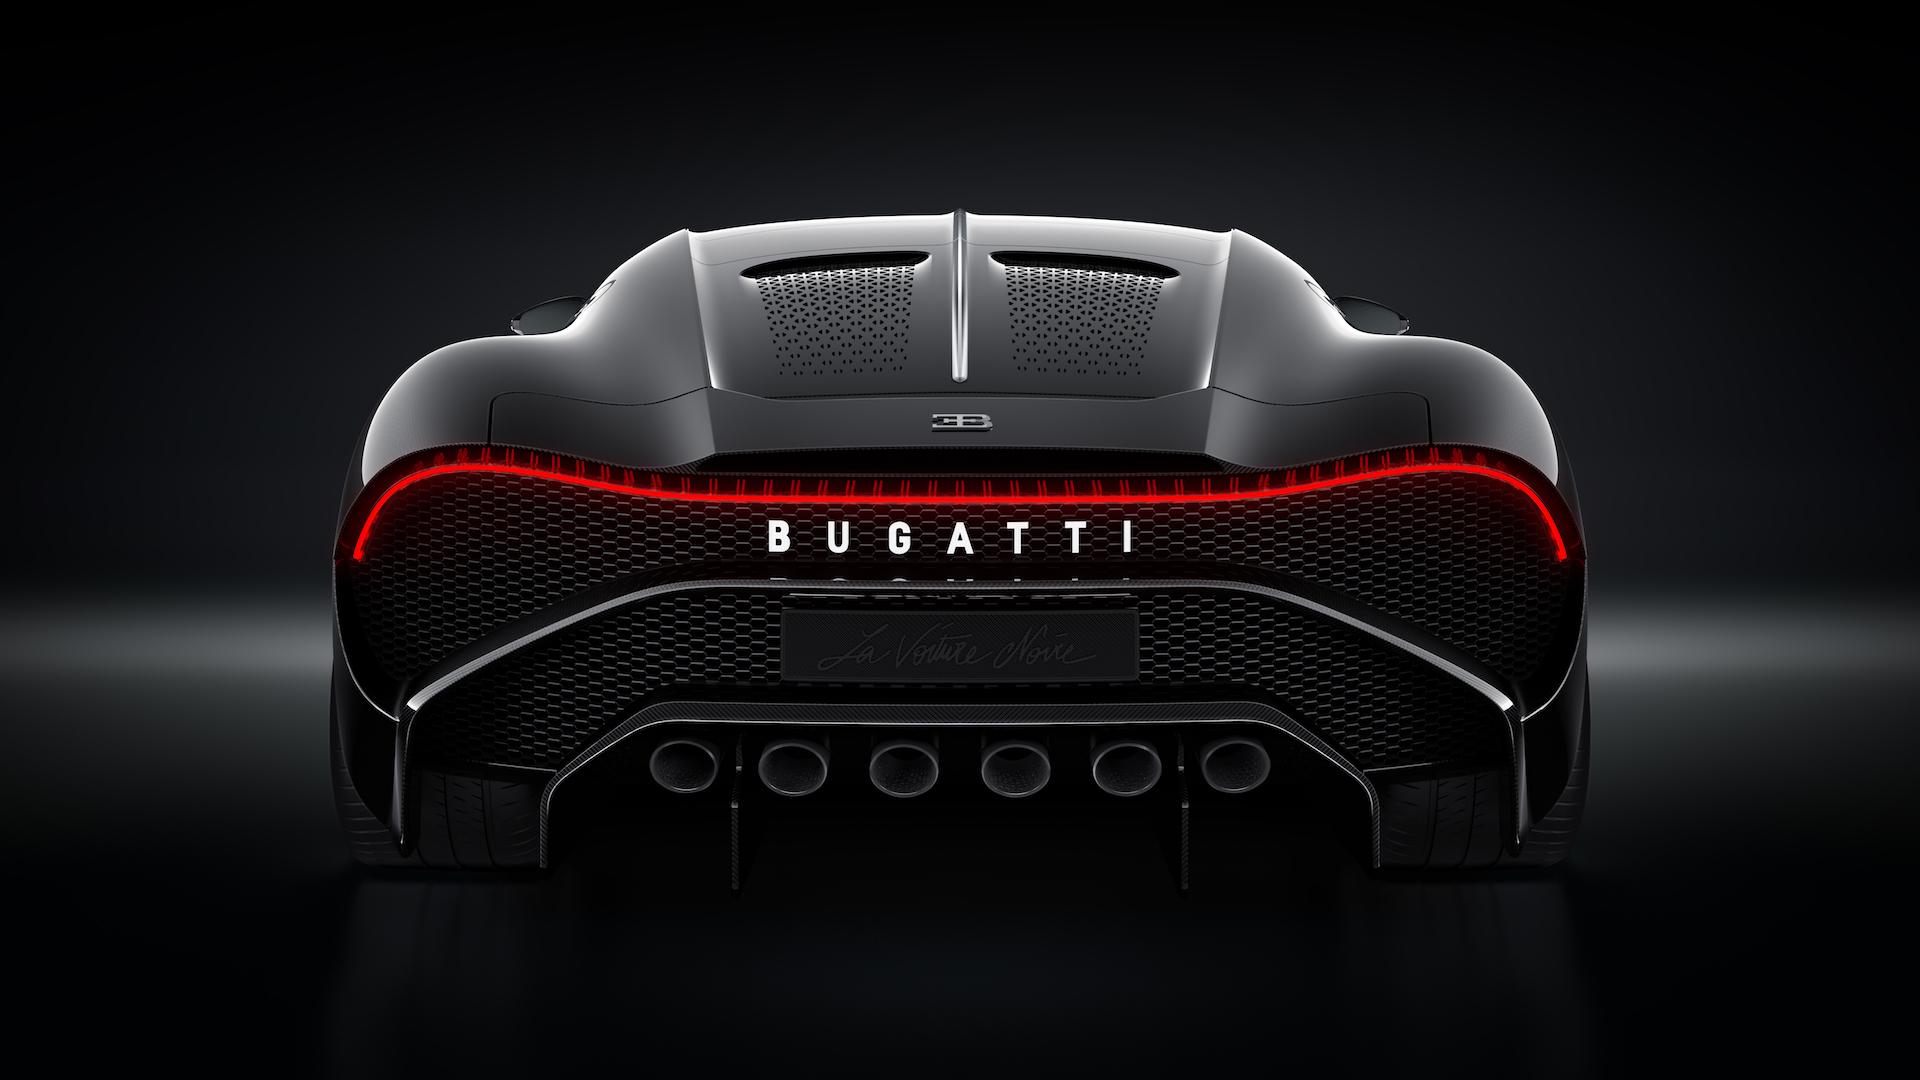 Bugatti Voiture Noire 6